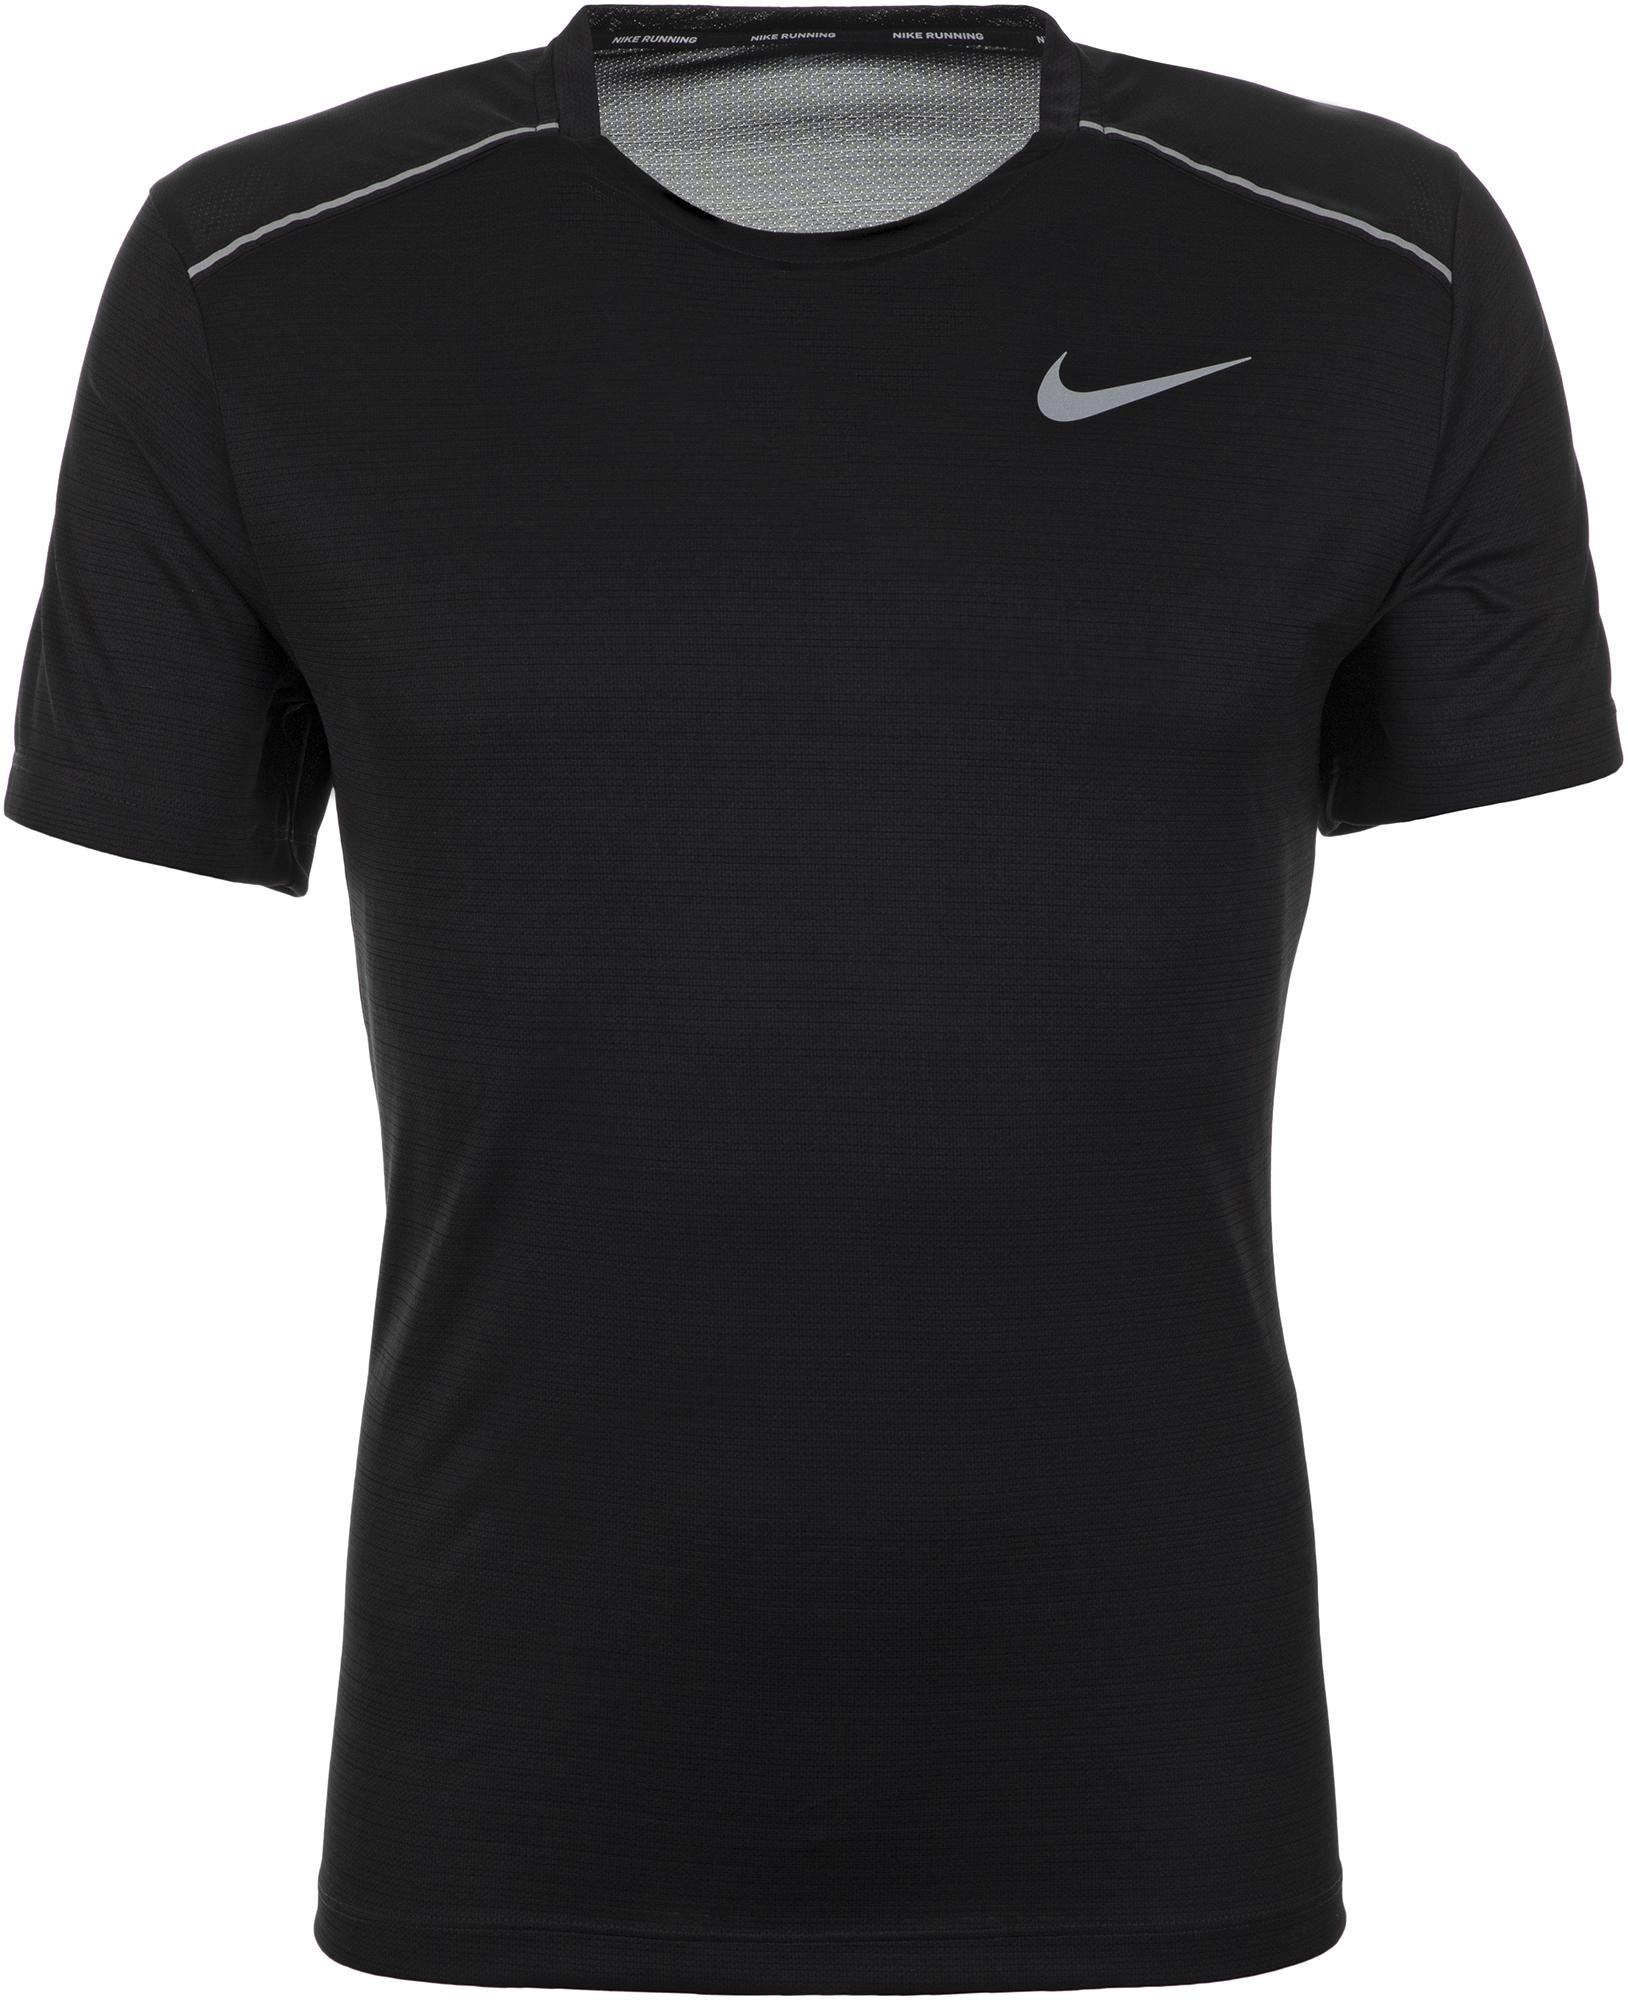 Nike Футболка мужская Dri-FIT Miler, размер 52-54